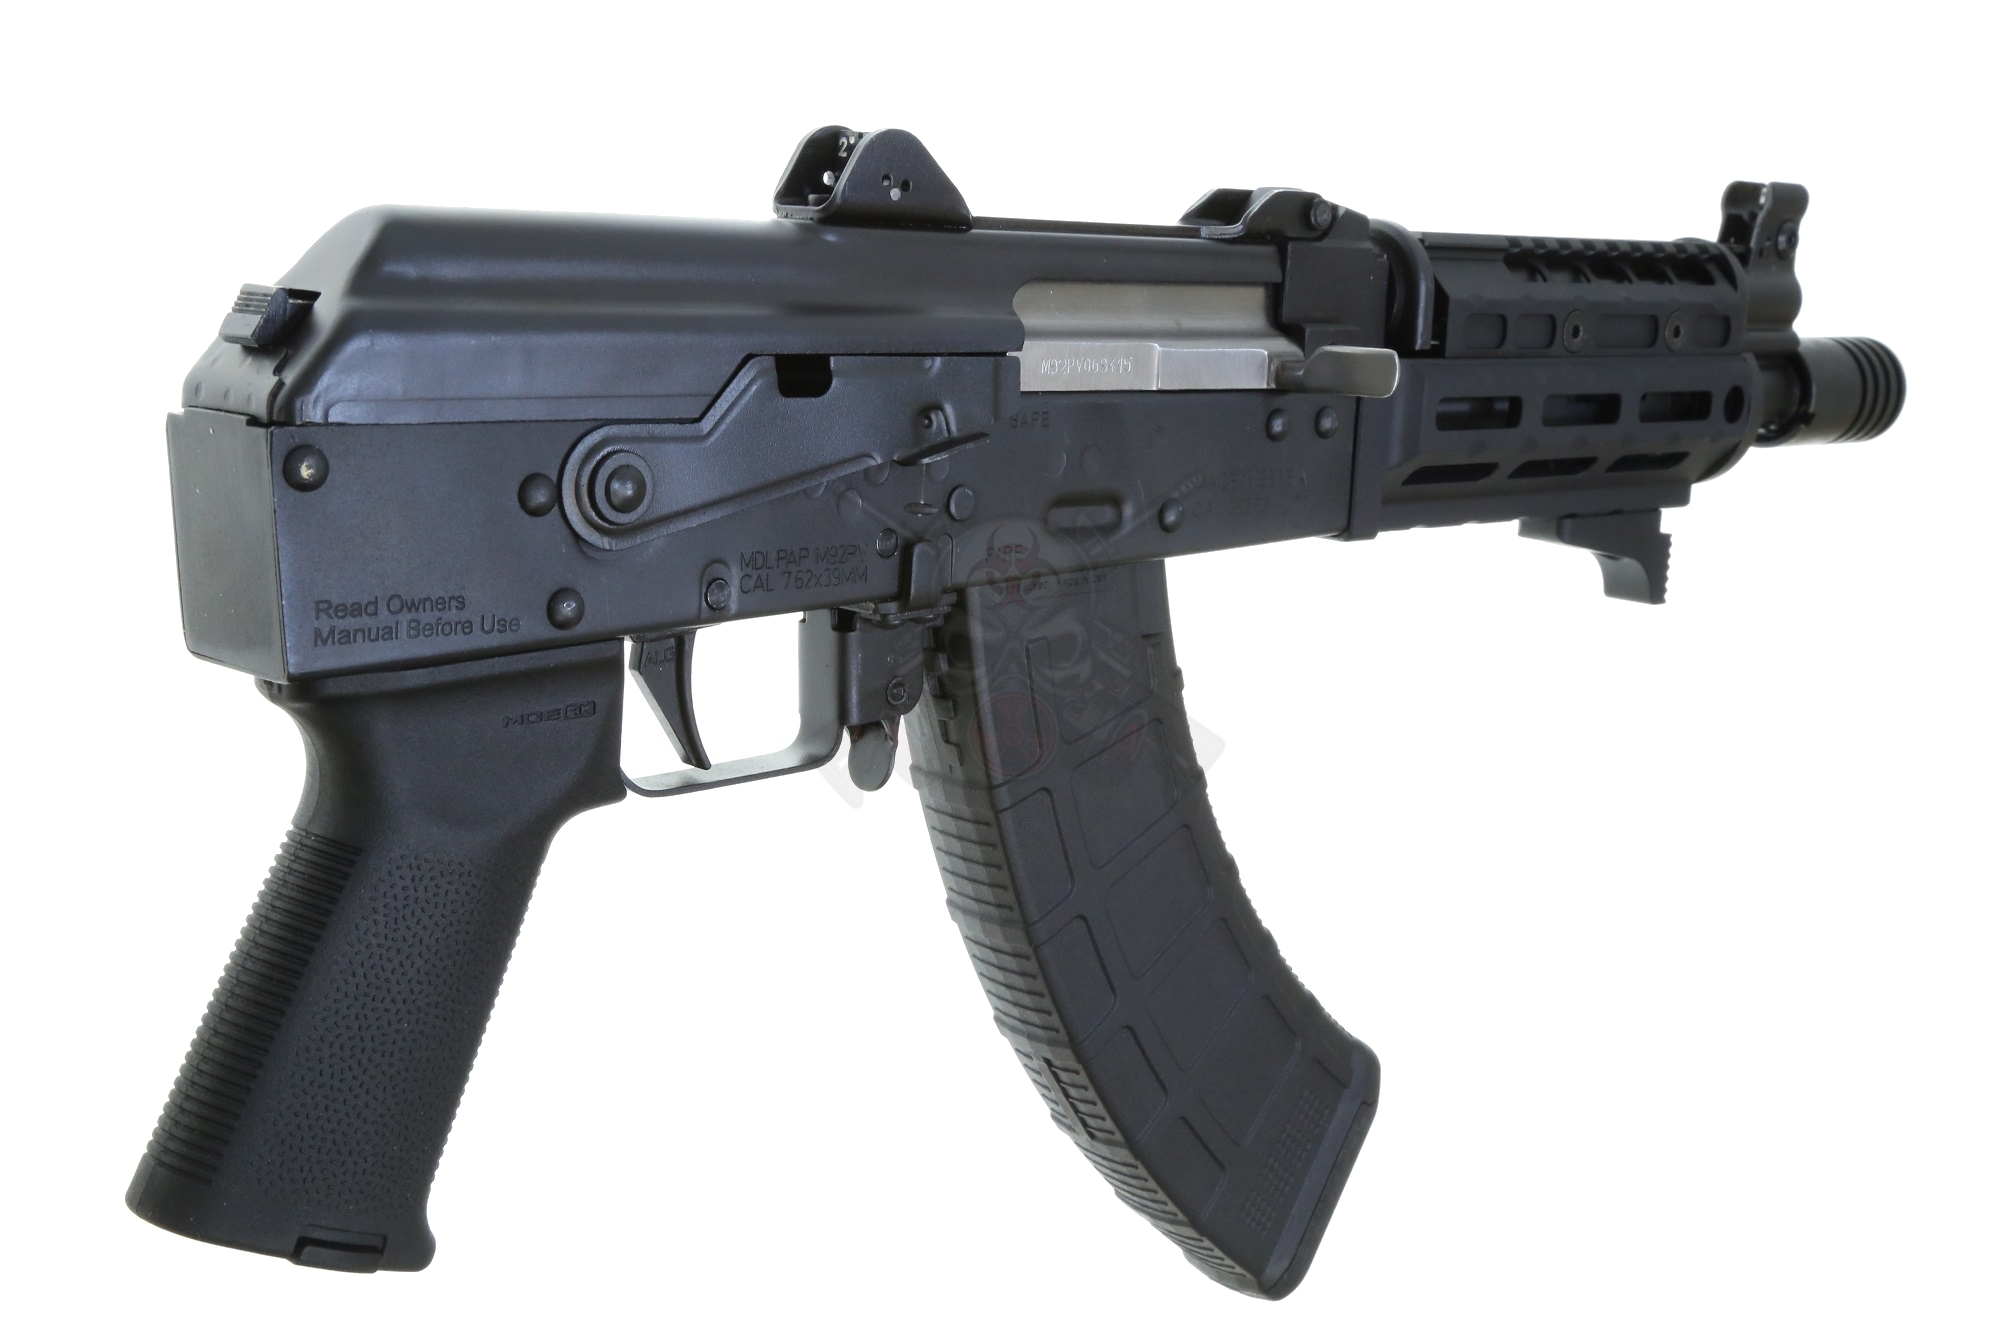 Prepper Custom ELITE PAP M92 AK Pistol 7 62x29 w/ SB Tactical SOB47 brace  (1) 30rd Pmag